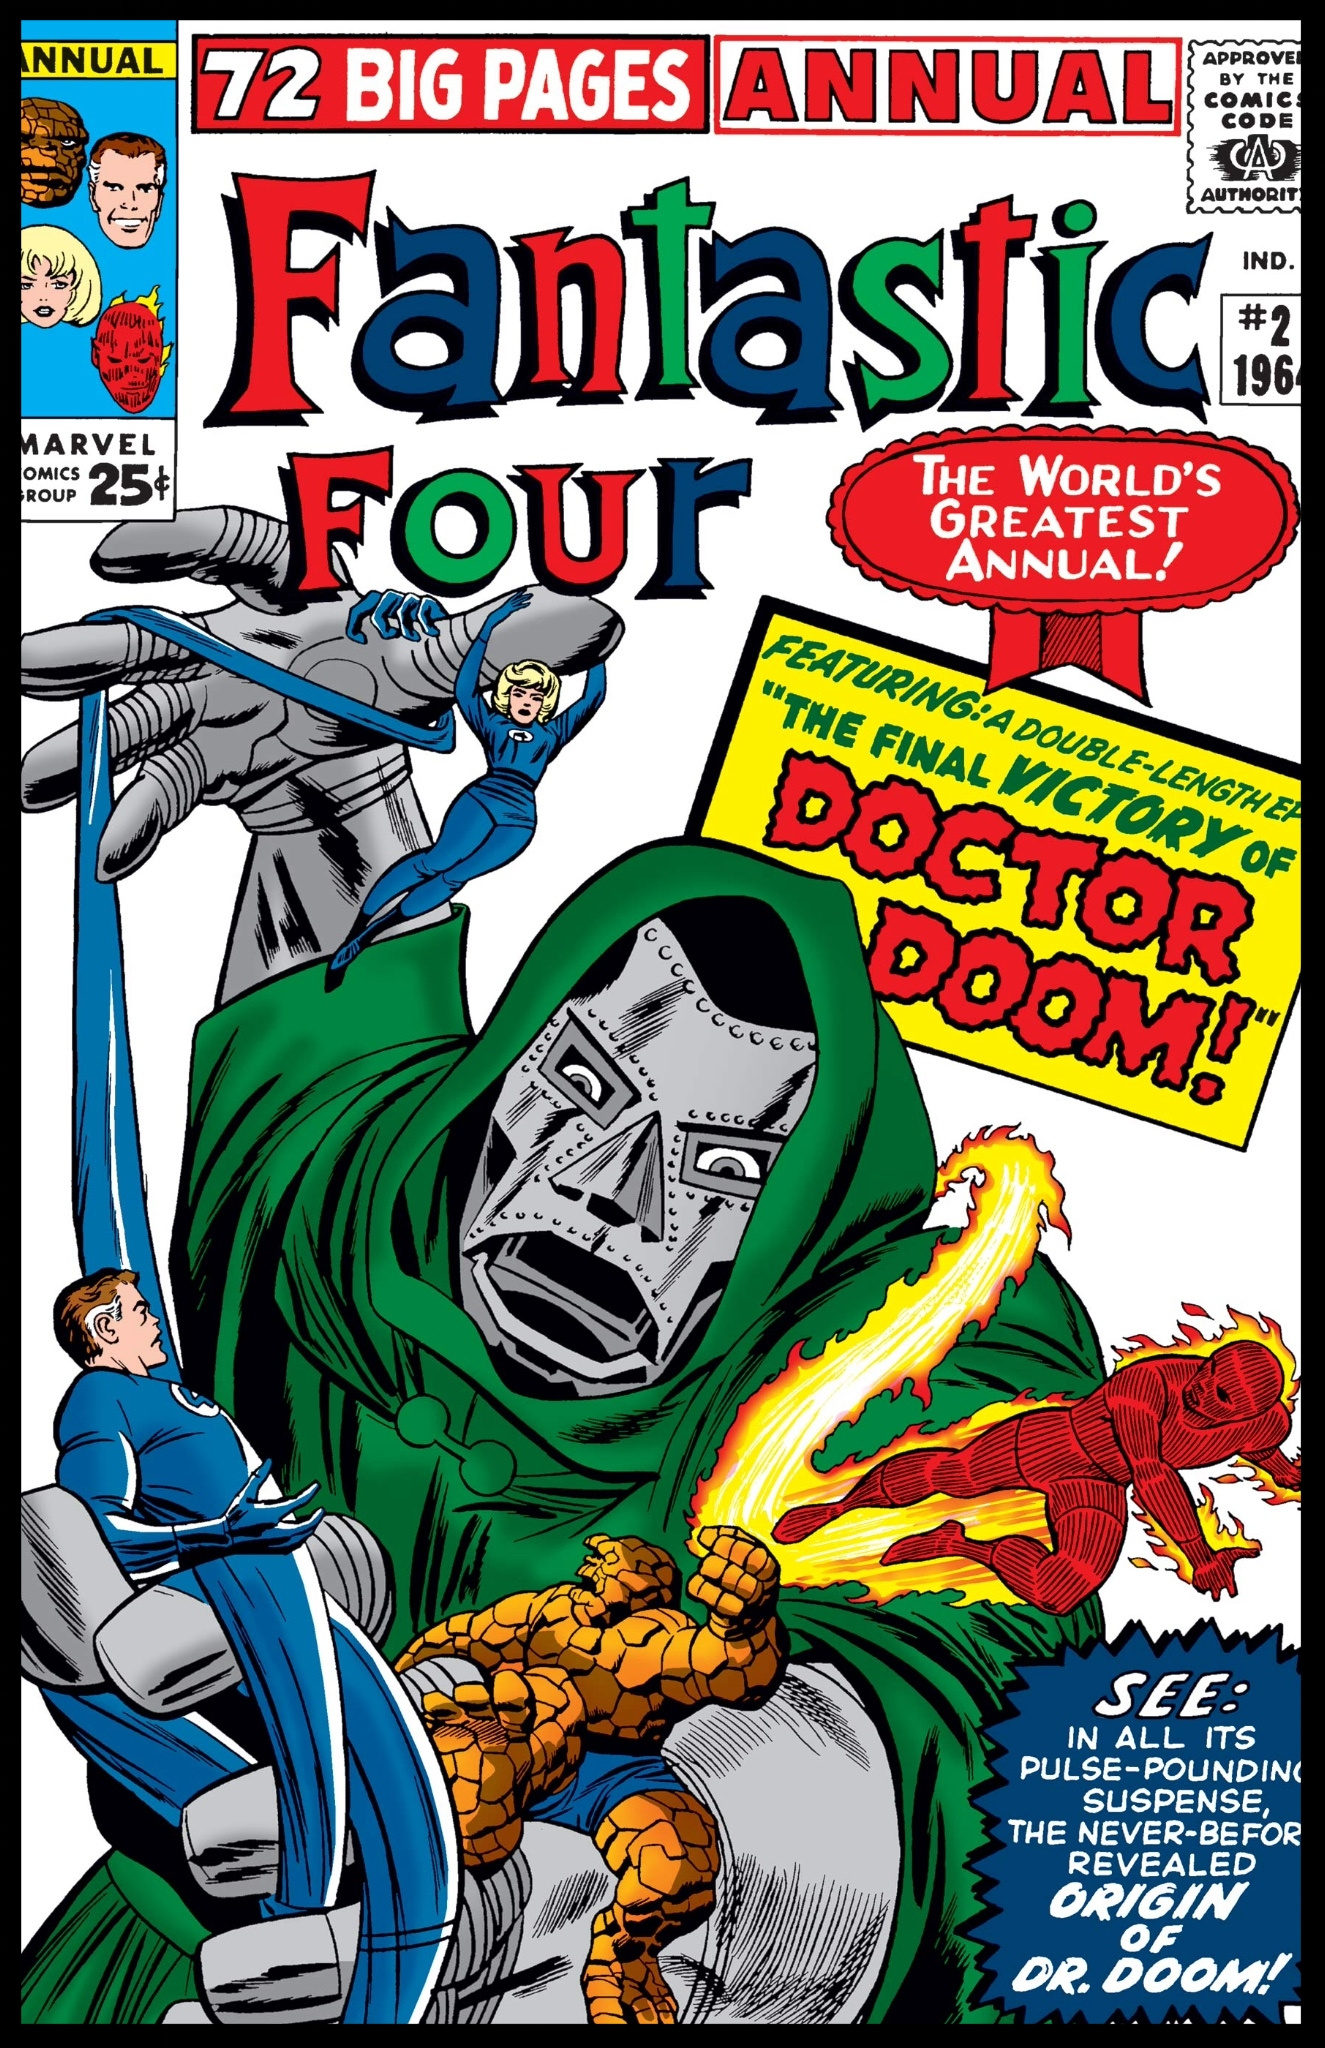 Fantastic Four Annual #2 Cover